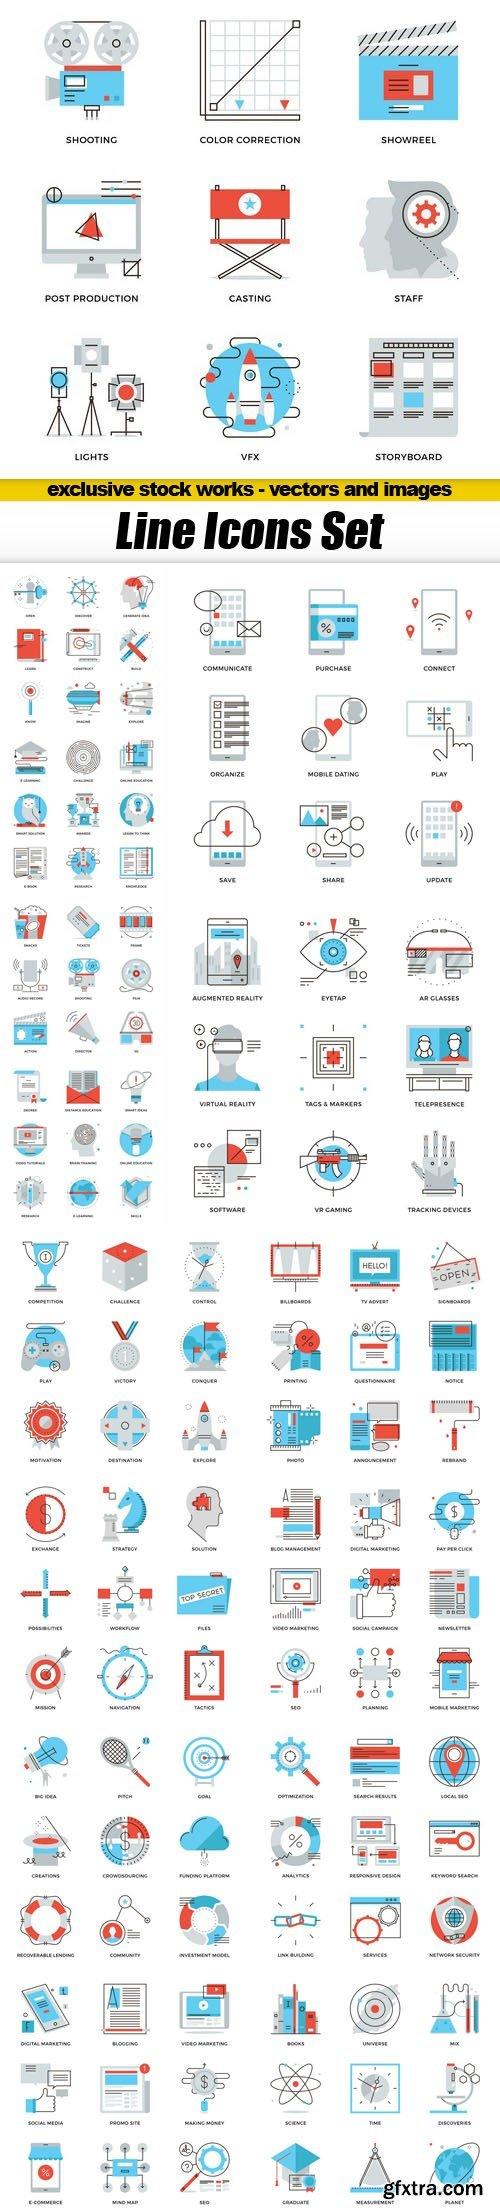 Line Icons Set - 15xEPS